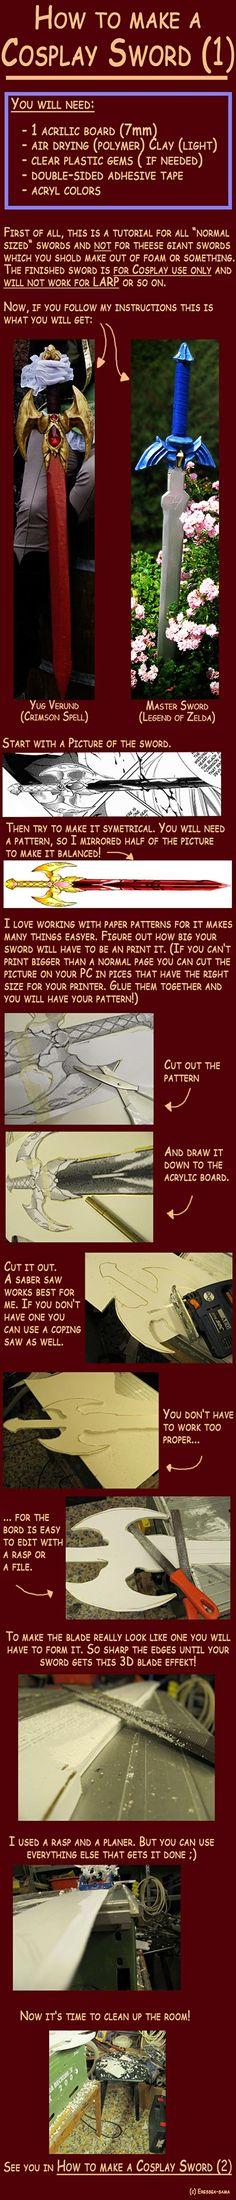 DIY Cosplay Sword Tutorials (9 Picture Instructions) - Snappy Pixels